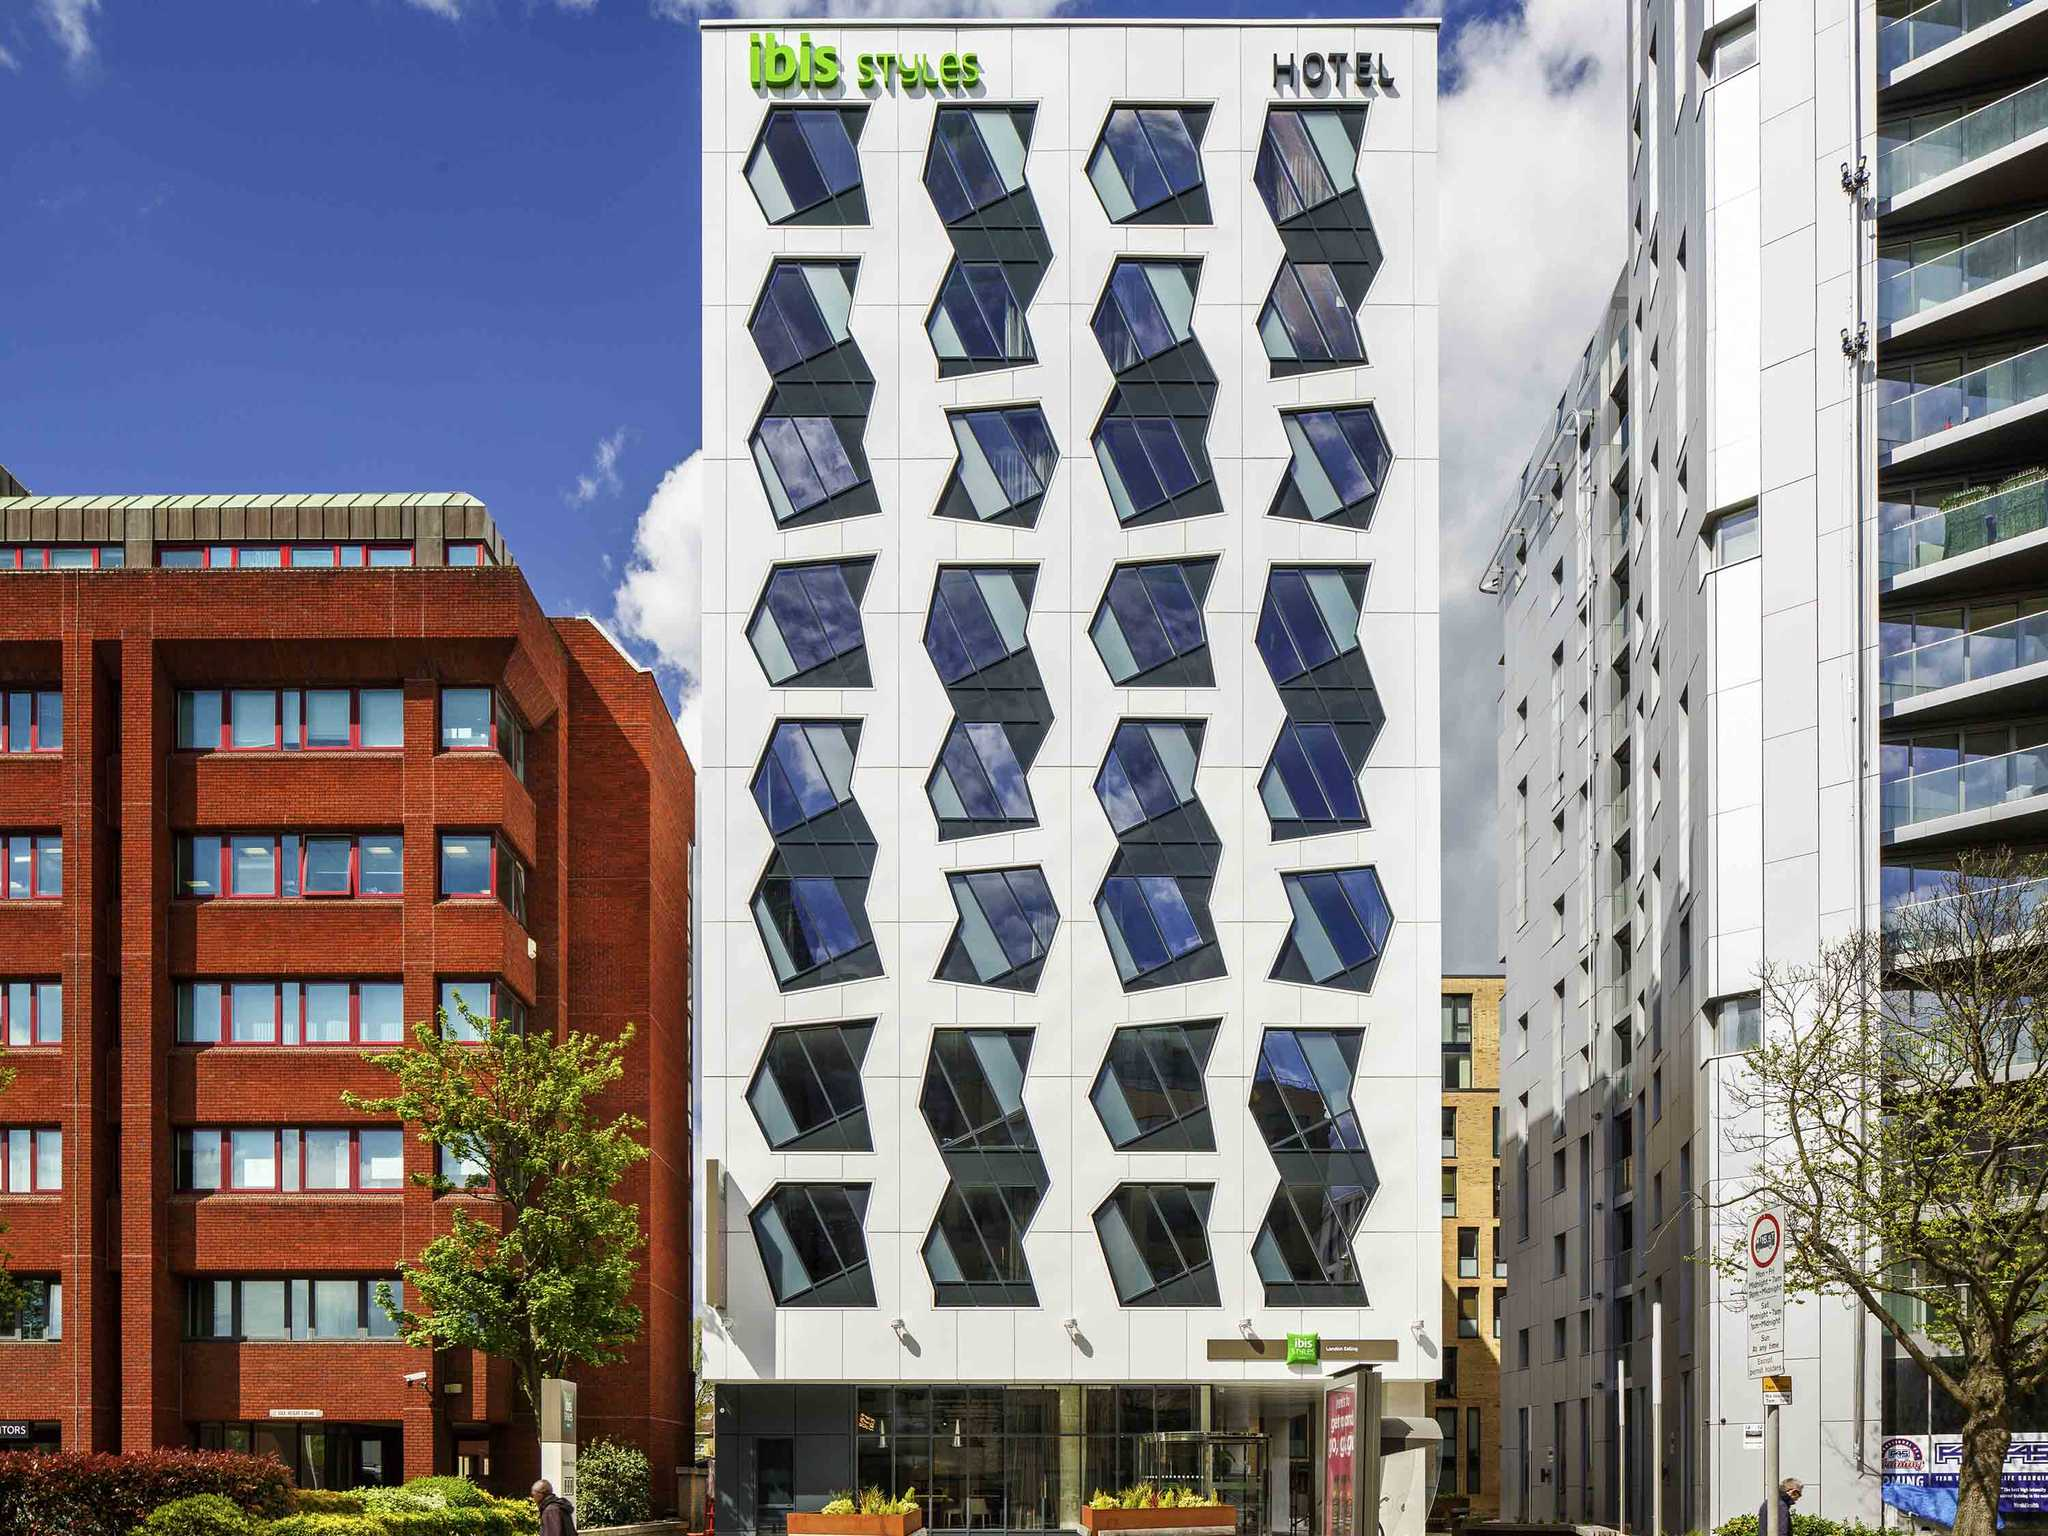 فندق - فندق إيبيس ستايلز ibis Styles لندن إيلينغ، يفتح في يونيو 2018